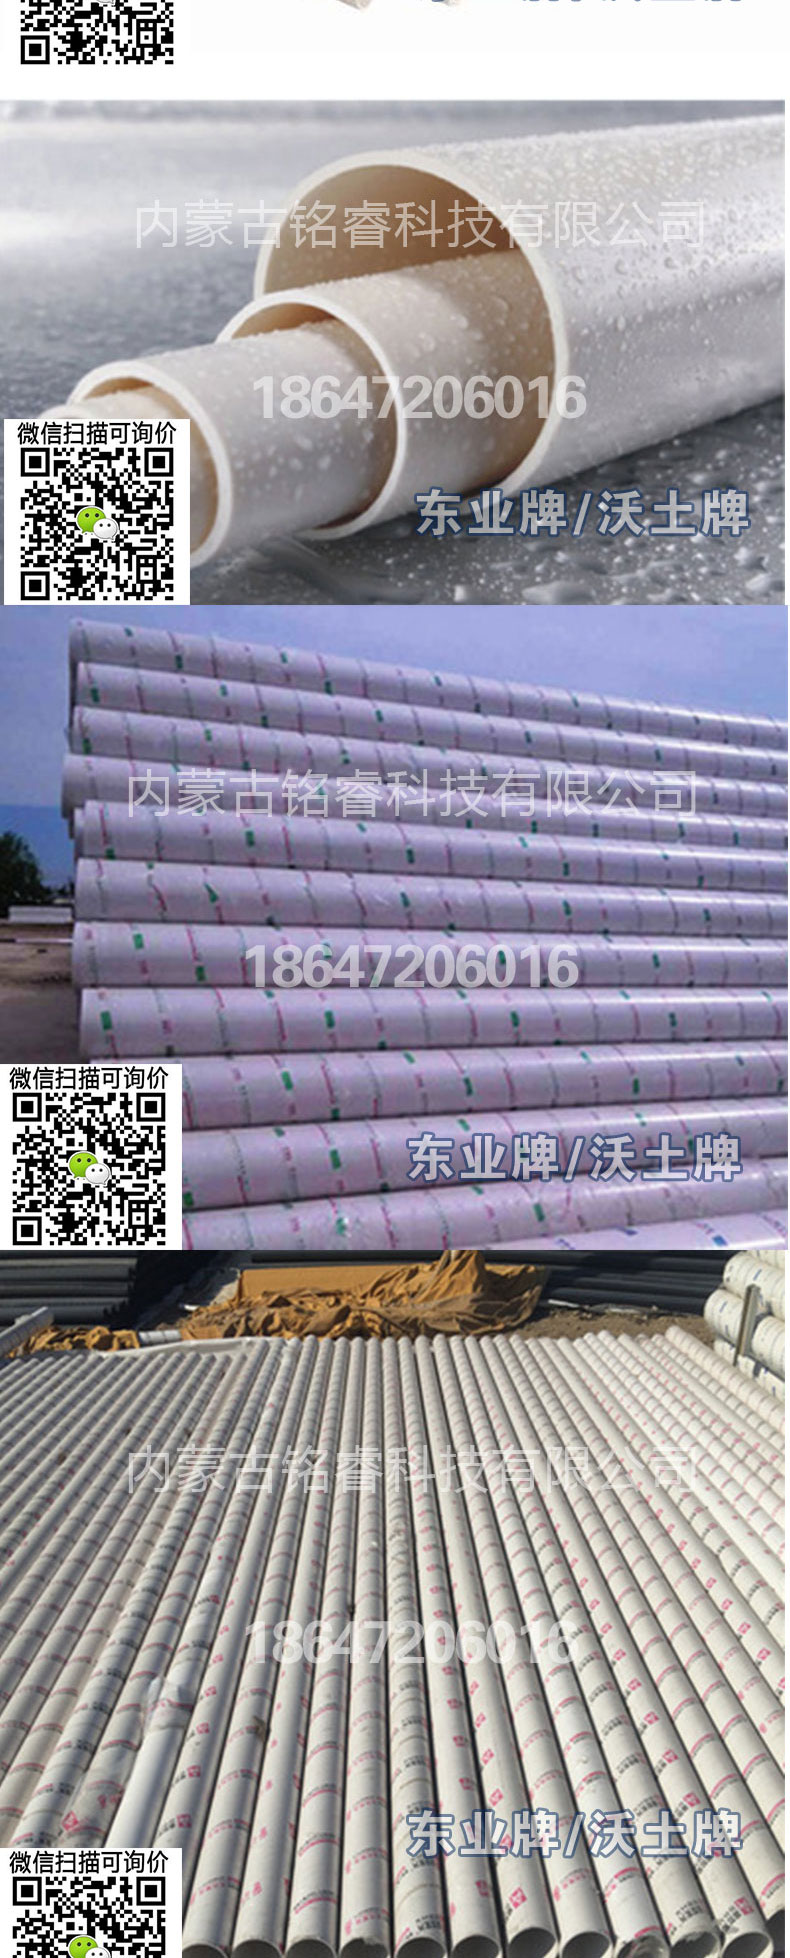 PVC-U排水管详情页_04.jpg